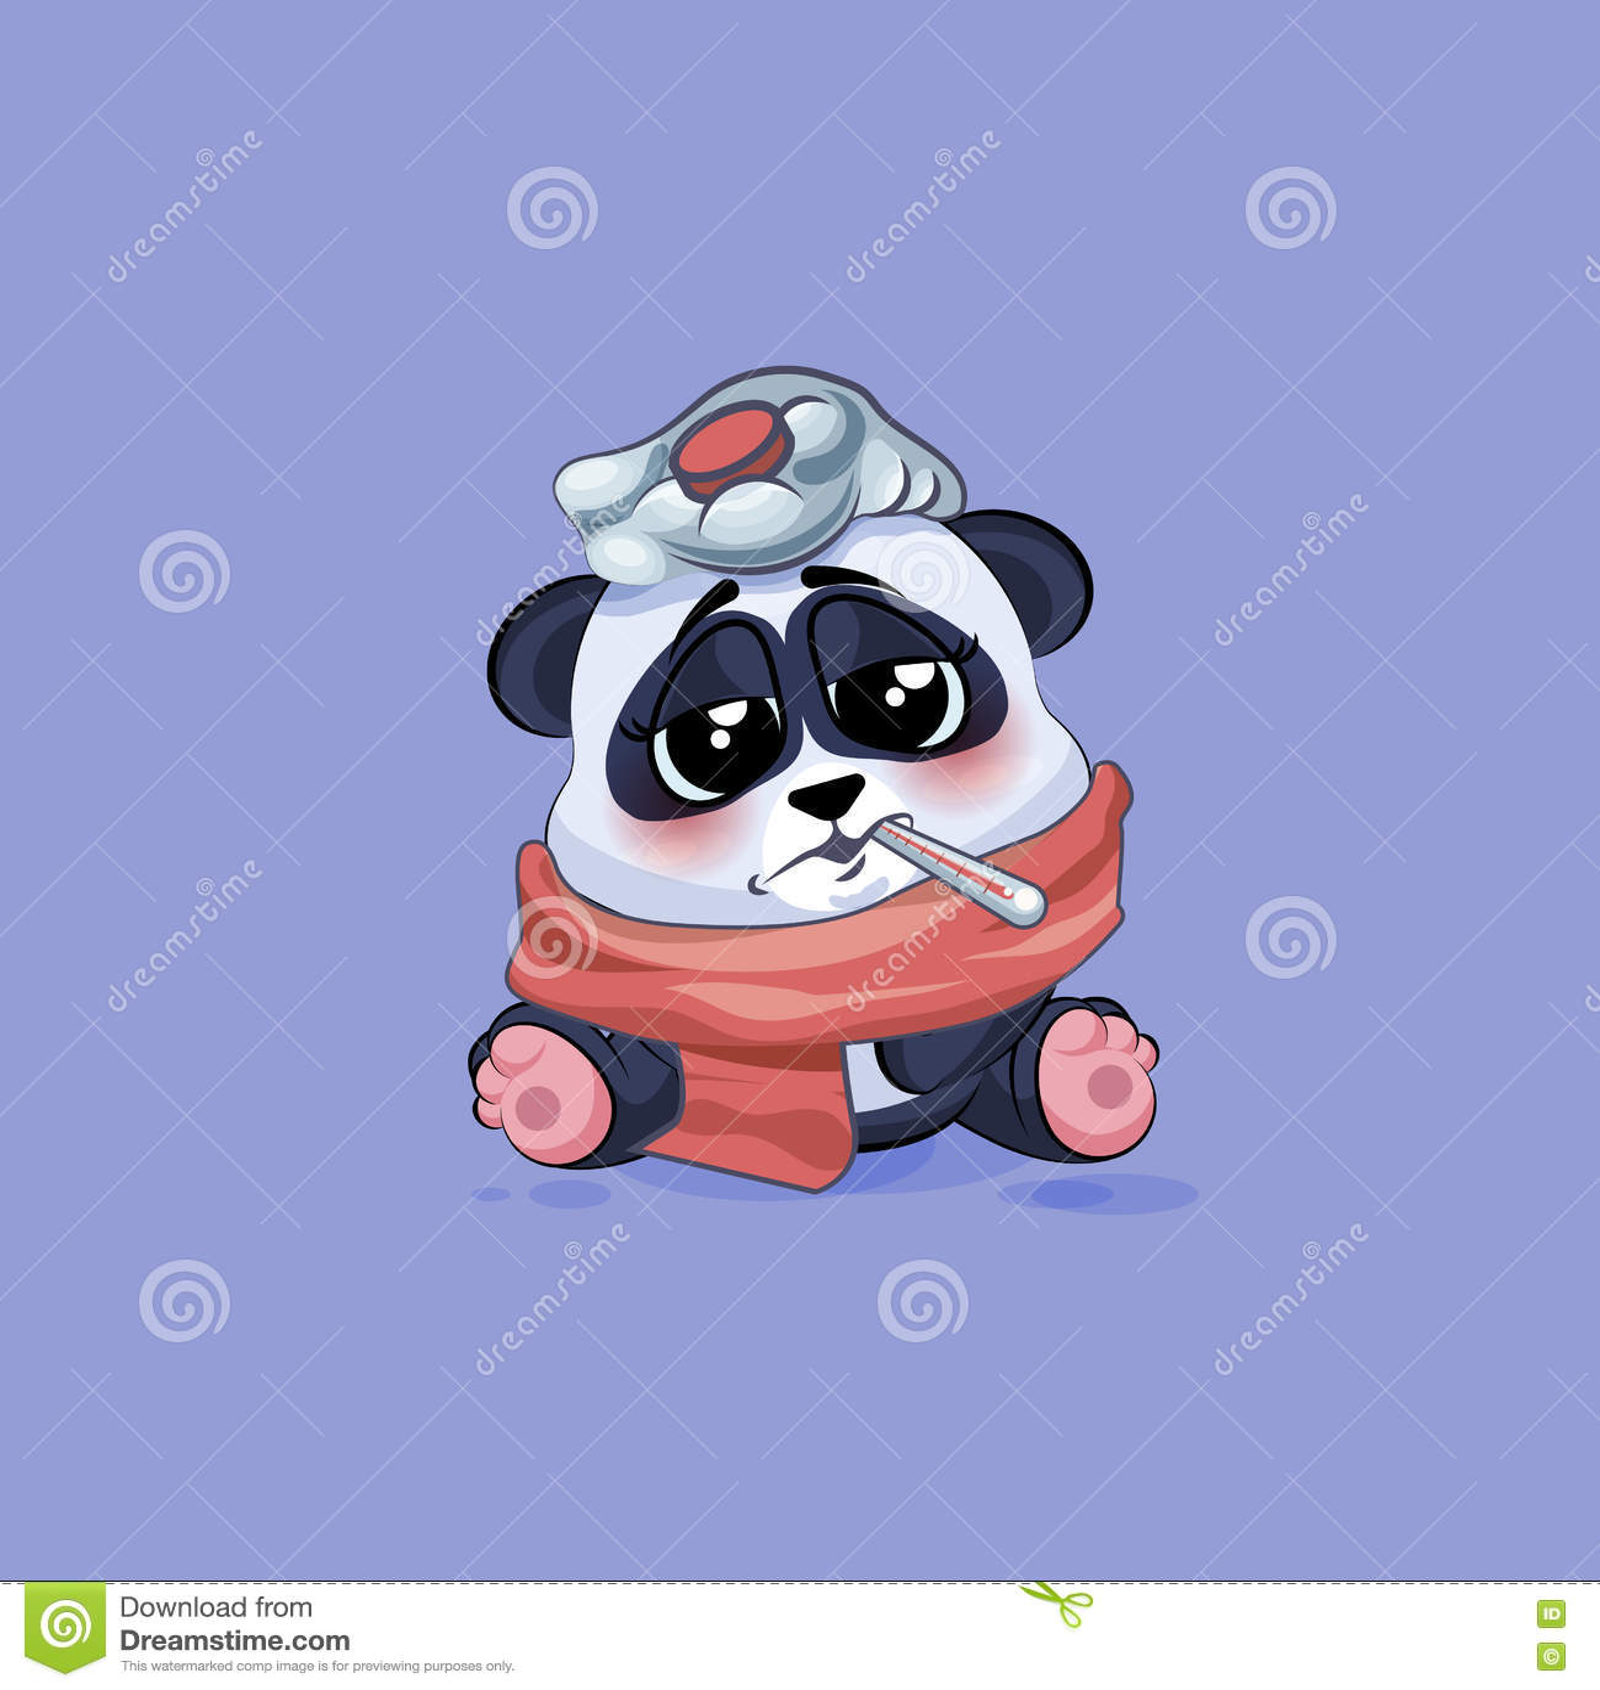 illustration emoji character cartoon panda sick with